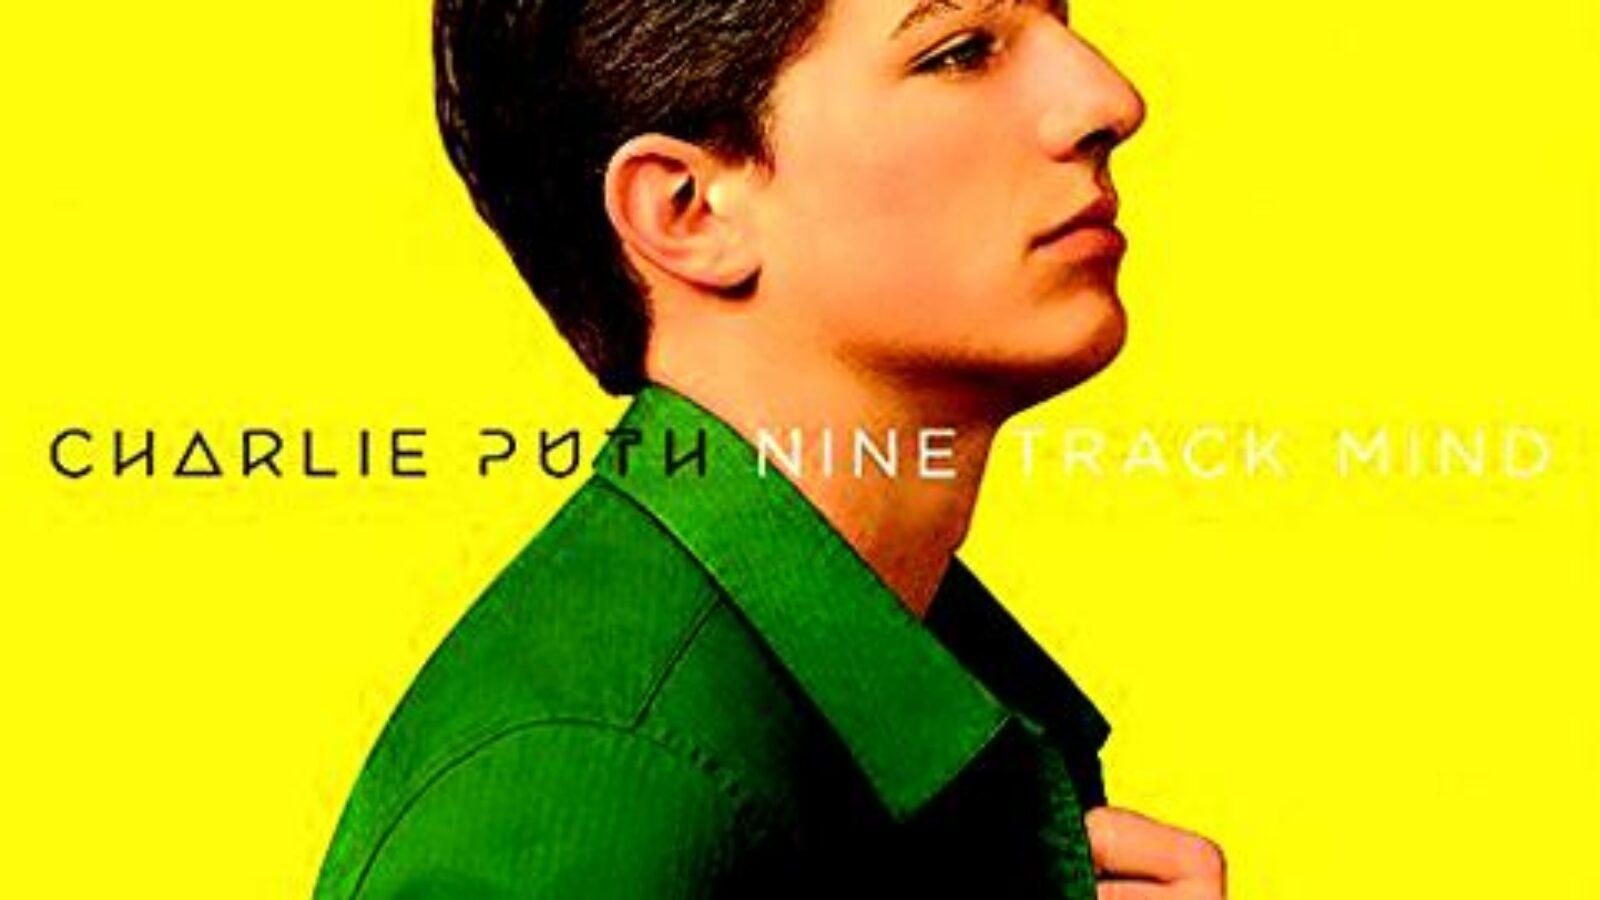 OXMOX CD-Tipps: CHARLIE PUTH, Nine Track Mind